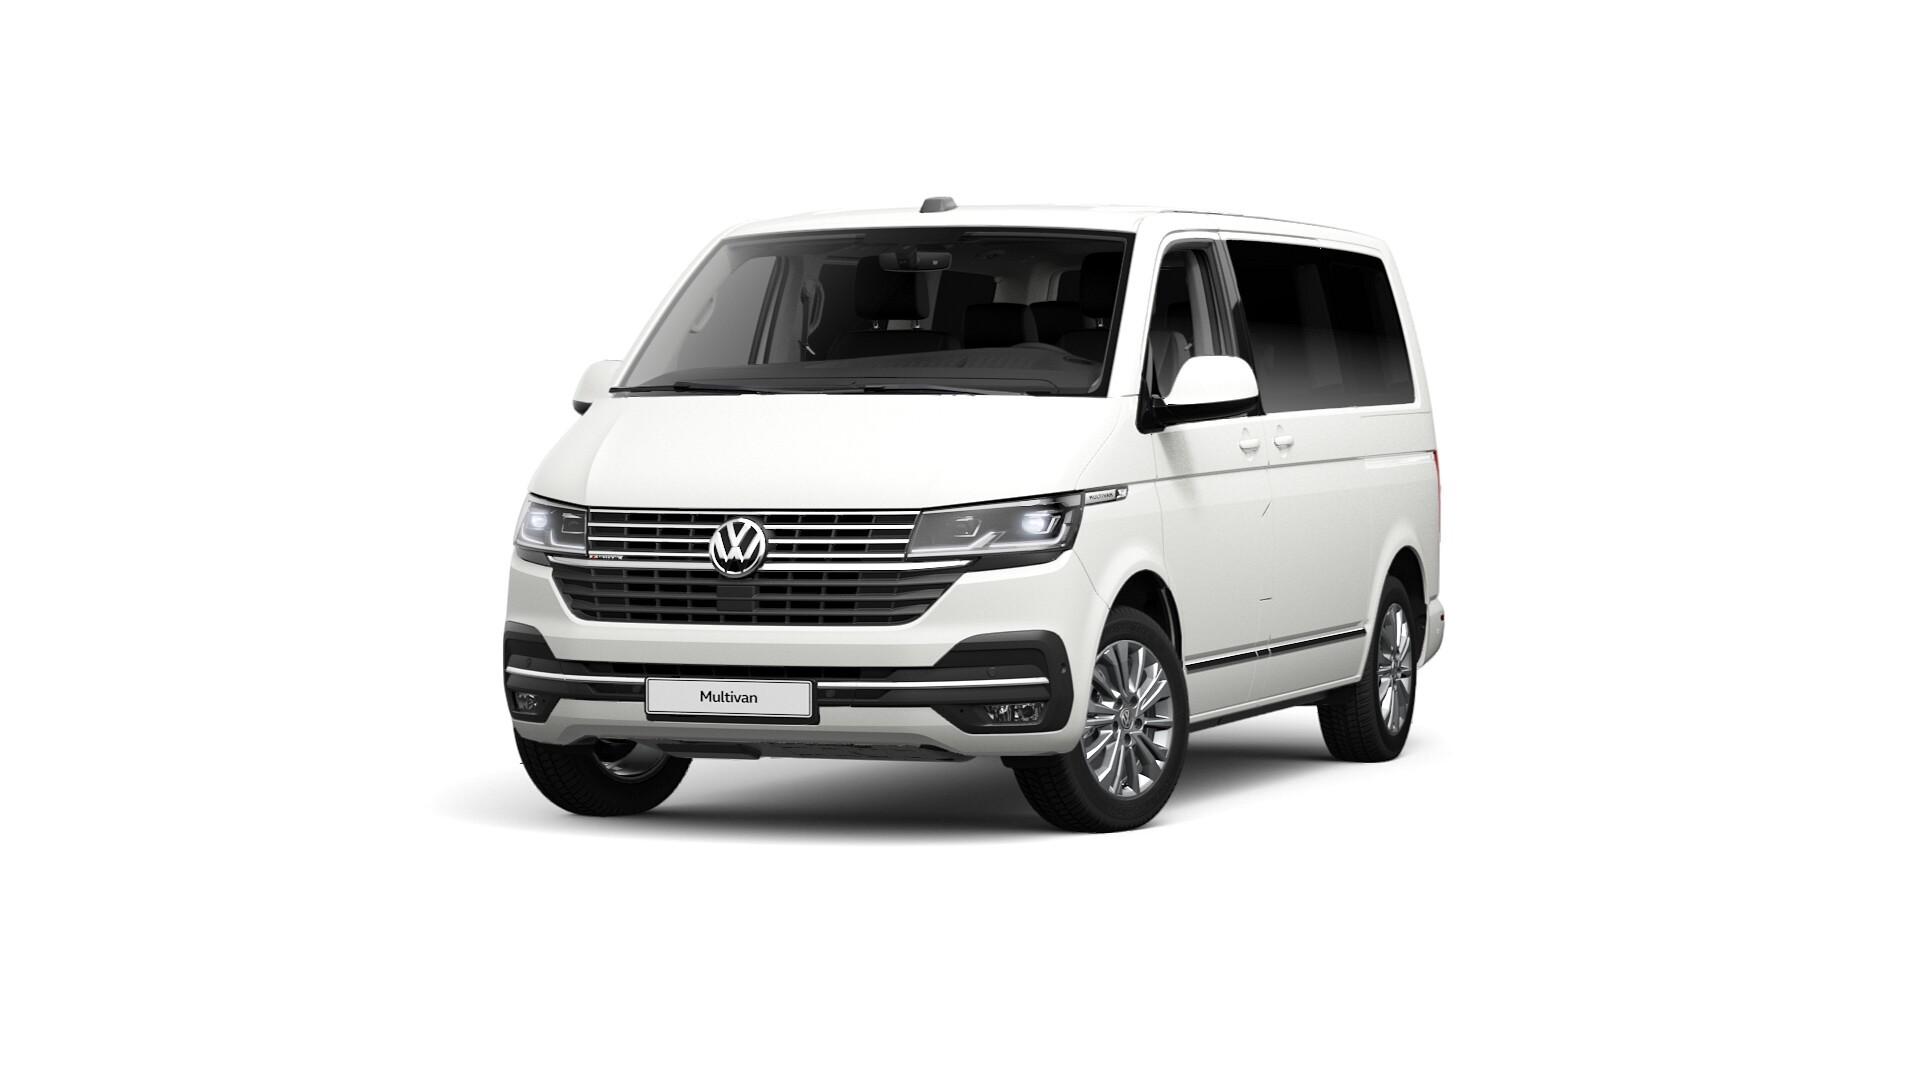 Volkswagen Multivan компактвэн/минивэн (Highline)